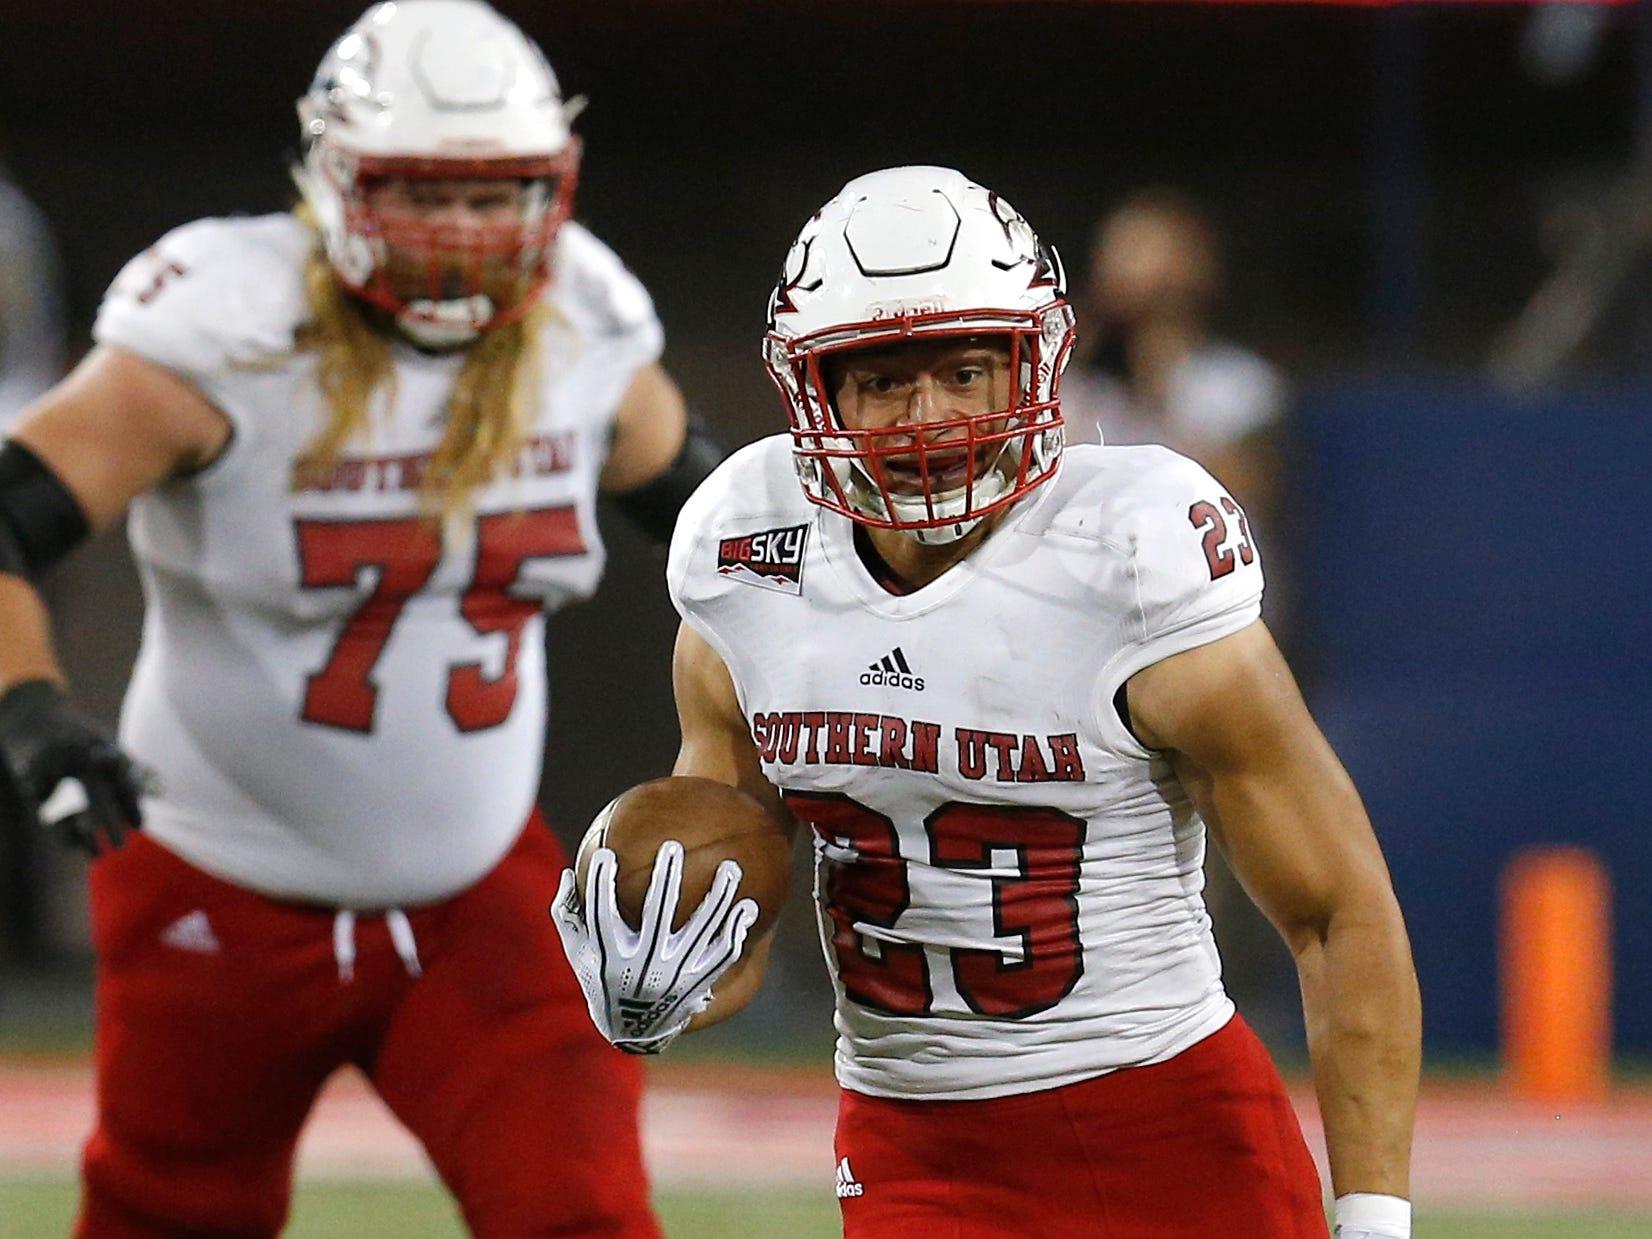 Southern Utah running back James Felila (23) in the first half during an NCAA college football game against Arizona, Saturday, Sept. 15, 2018, in Tucson, Ariz. (AP Photo/Rick Scuteri)